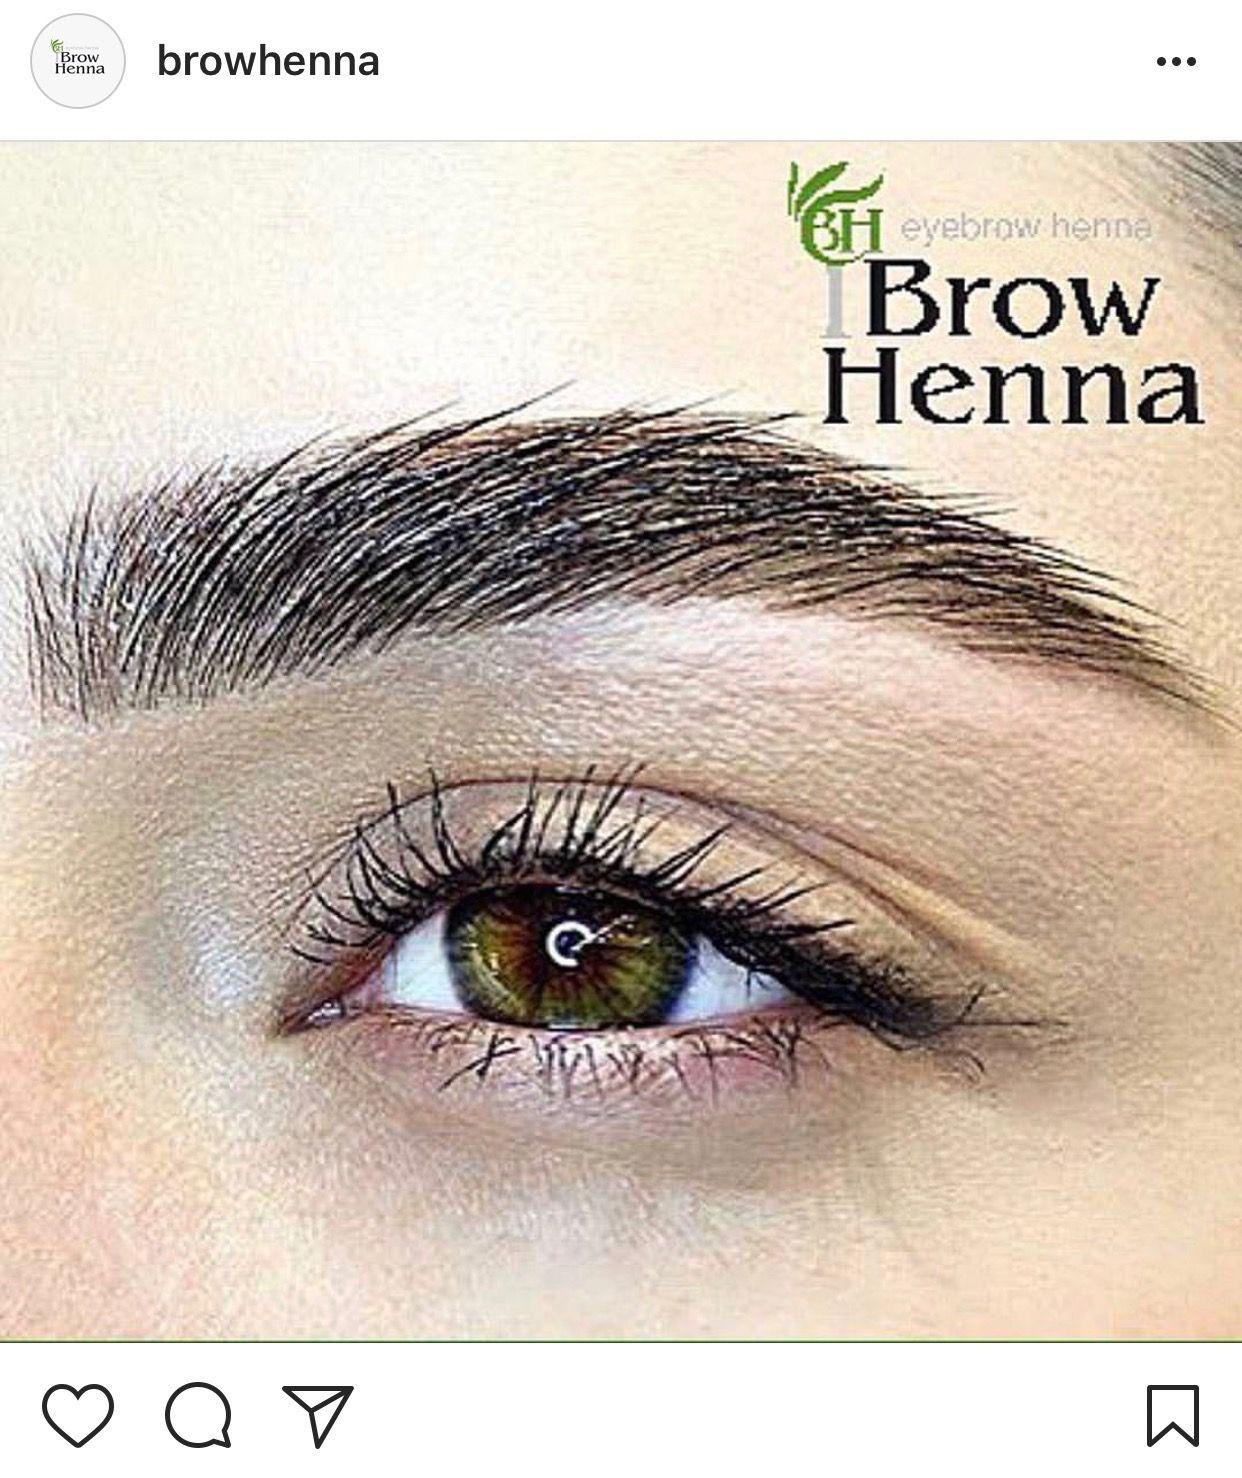 Pin By Irina Levchuk On Bh Brow Henna The Best Organic Tint